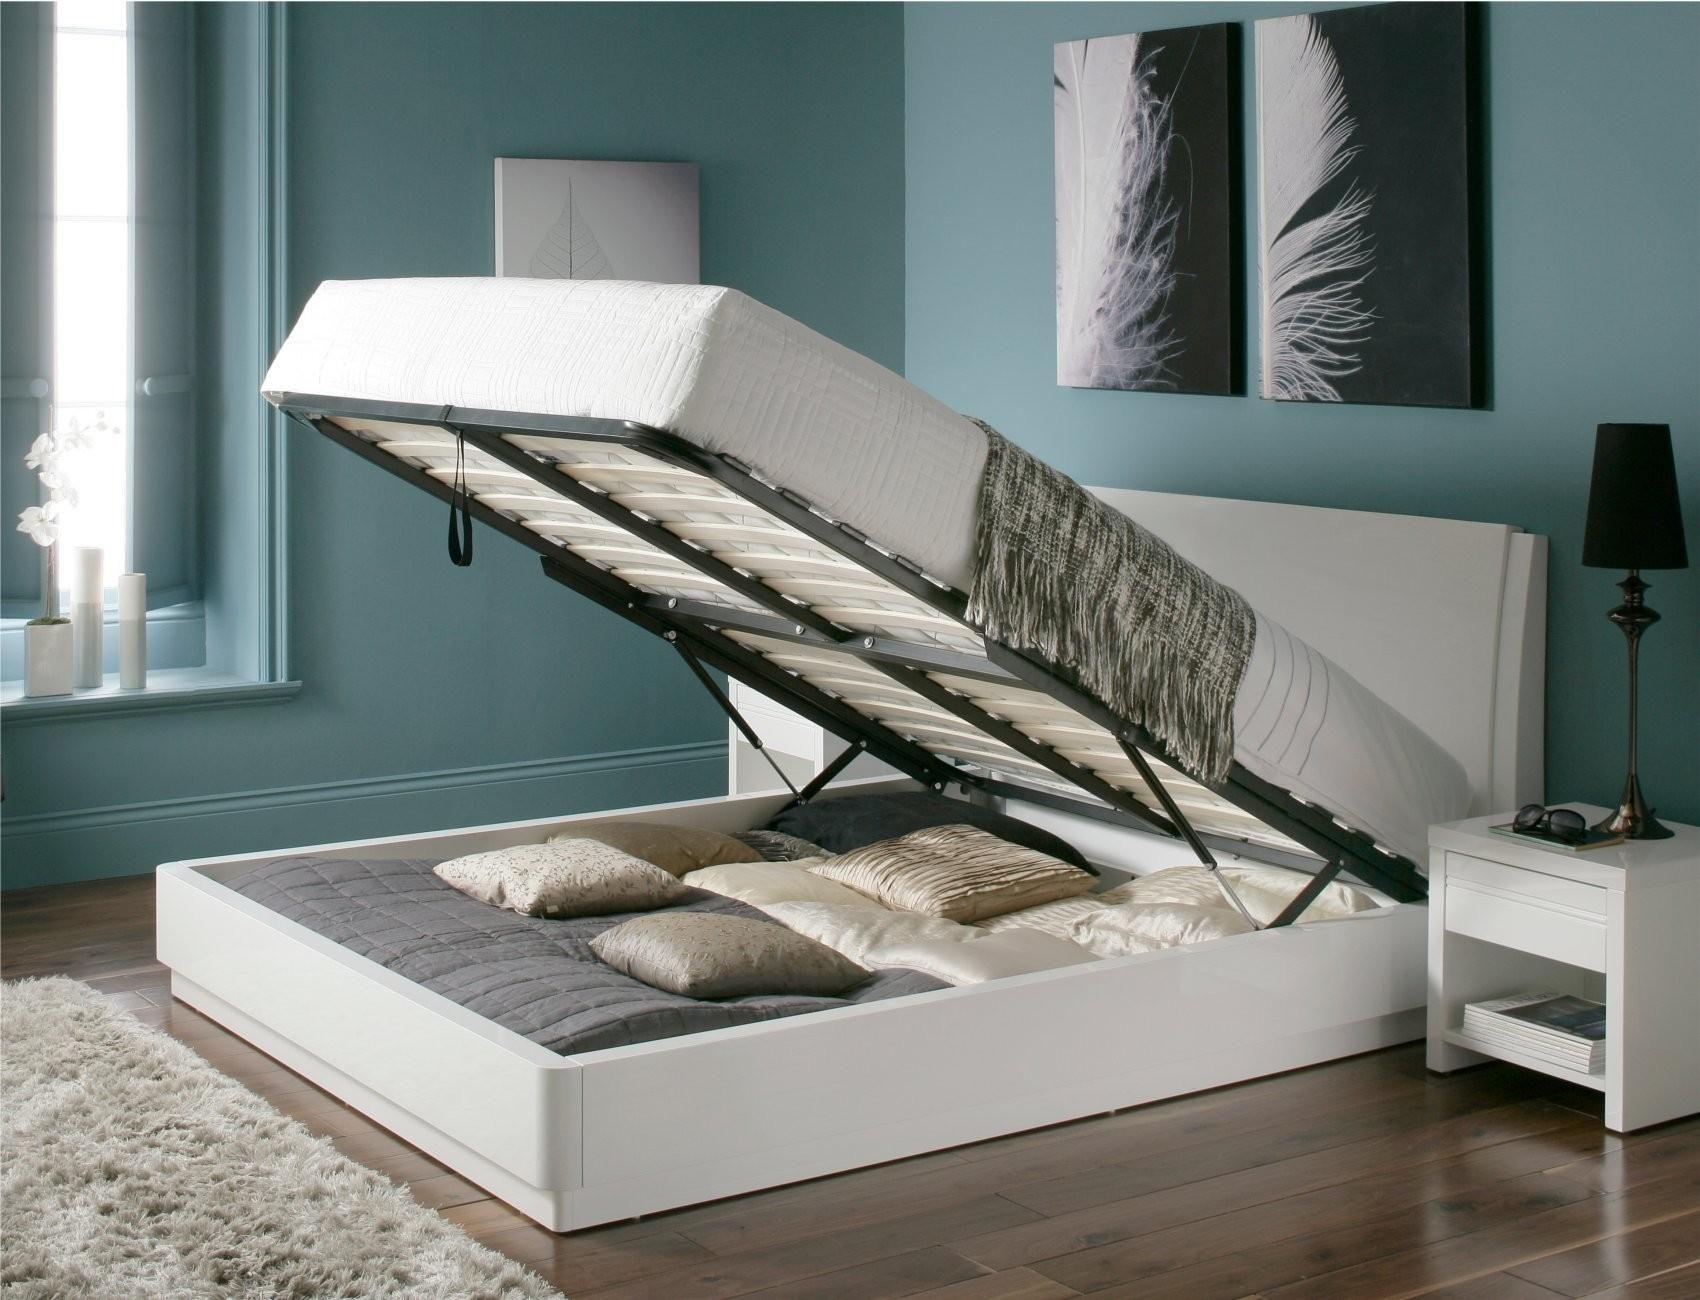 Aden High Gloss Ottoman Storage Bed – WHITE